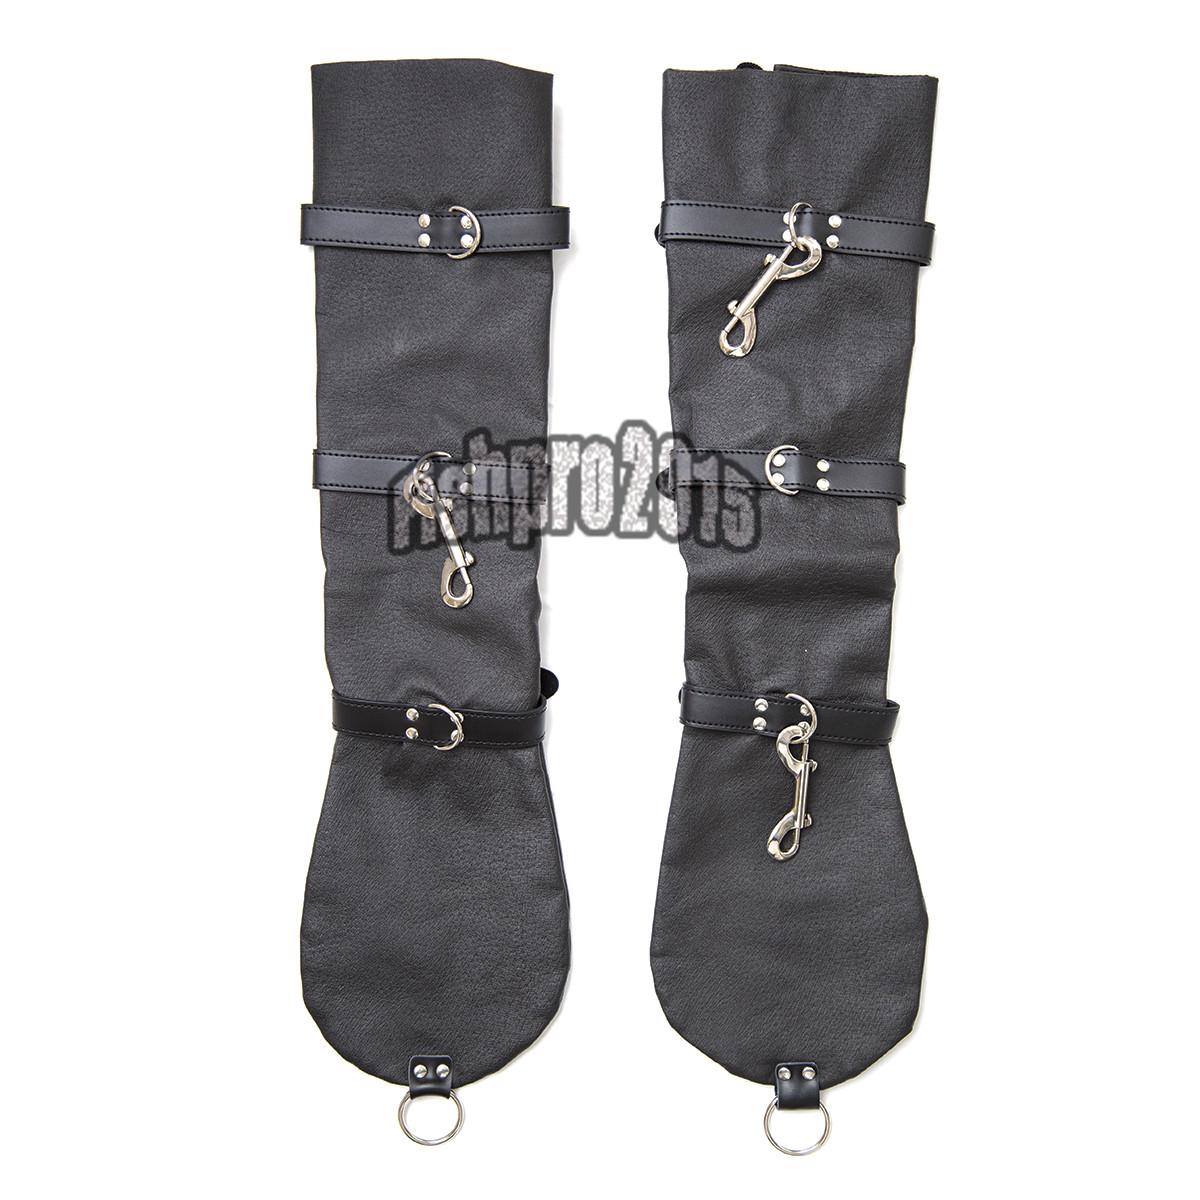 Slave Leather Arm Binder Strict Sleeves Garment Hand